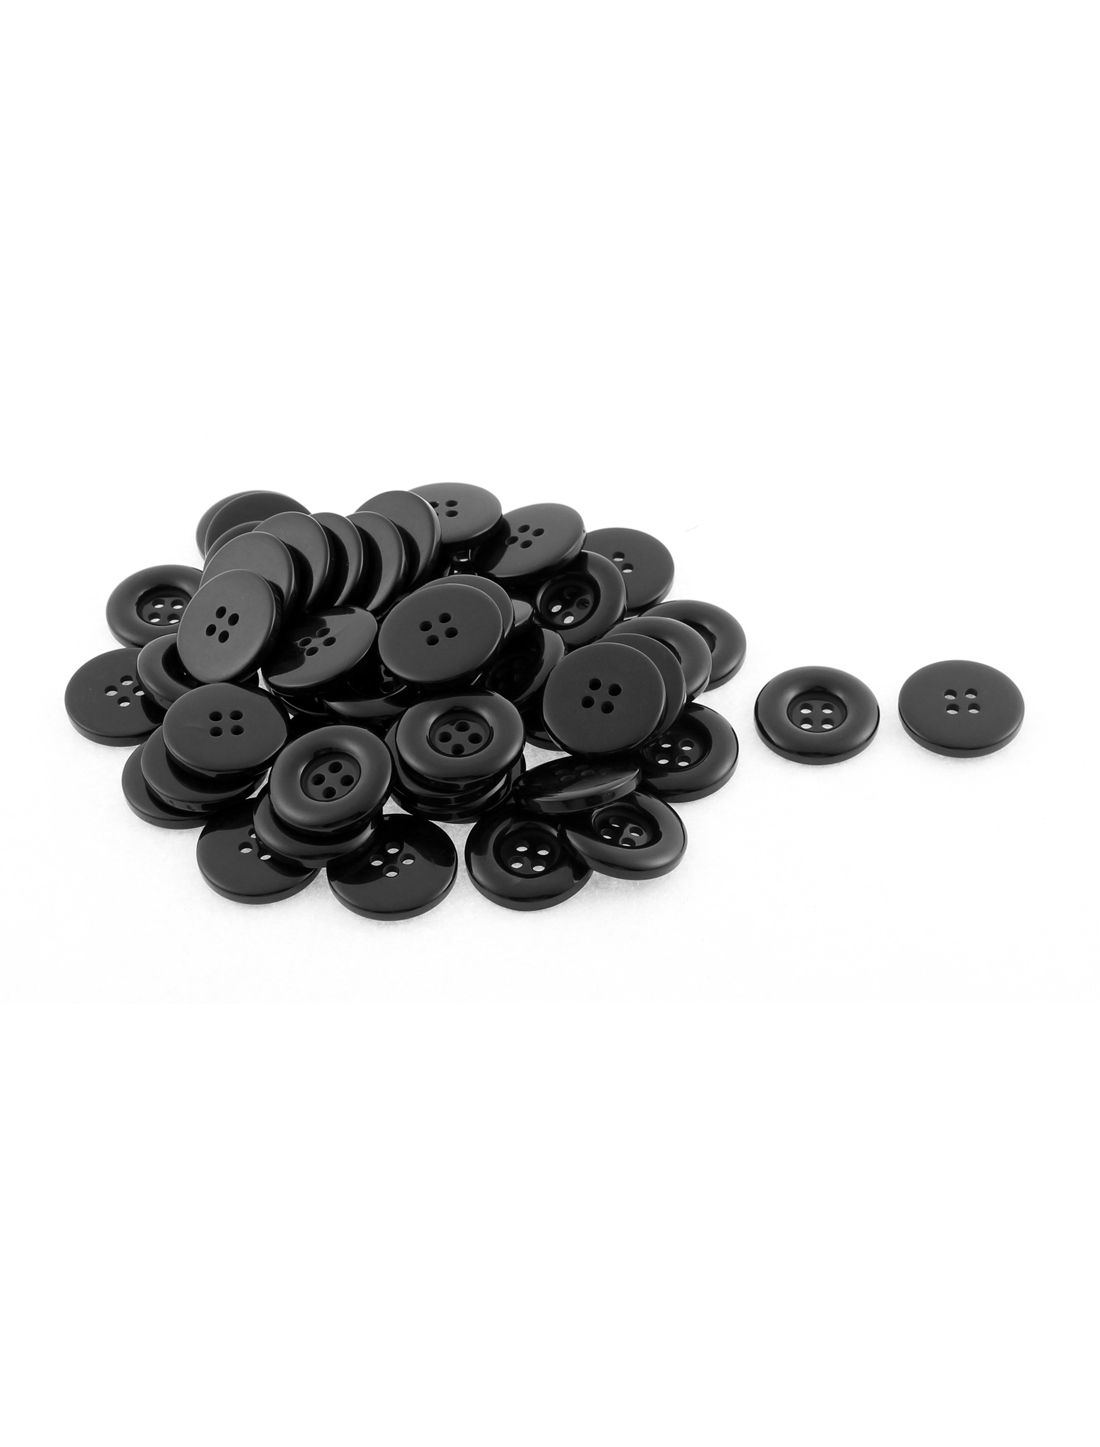 Craft Scrapbook Sewing Clothes Buttons Black 23mm Dia 4 Holes 50Pcs